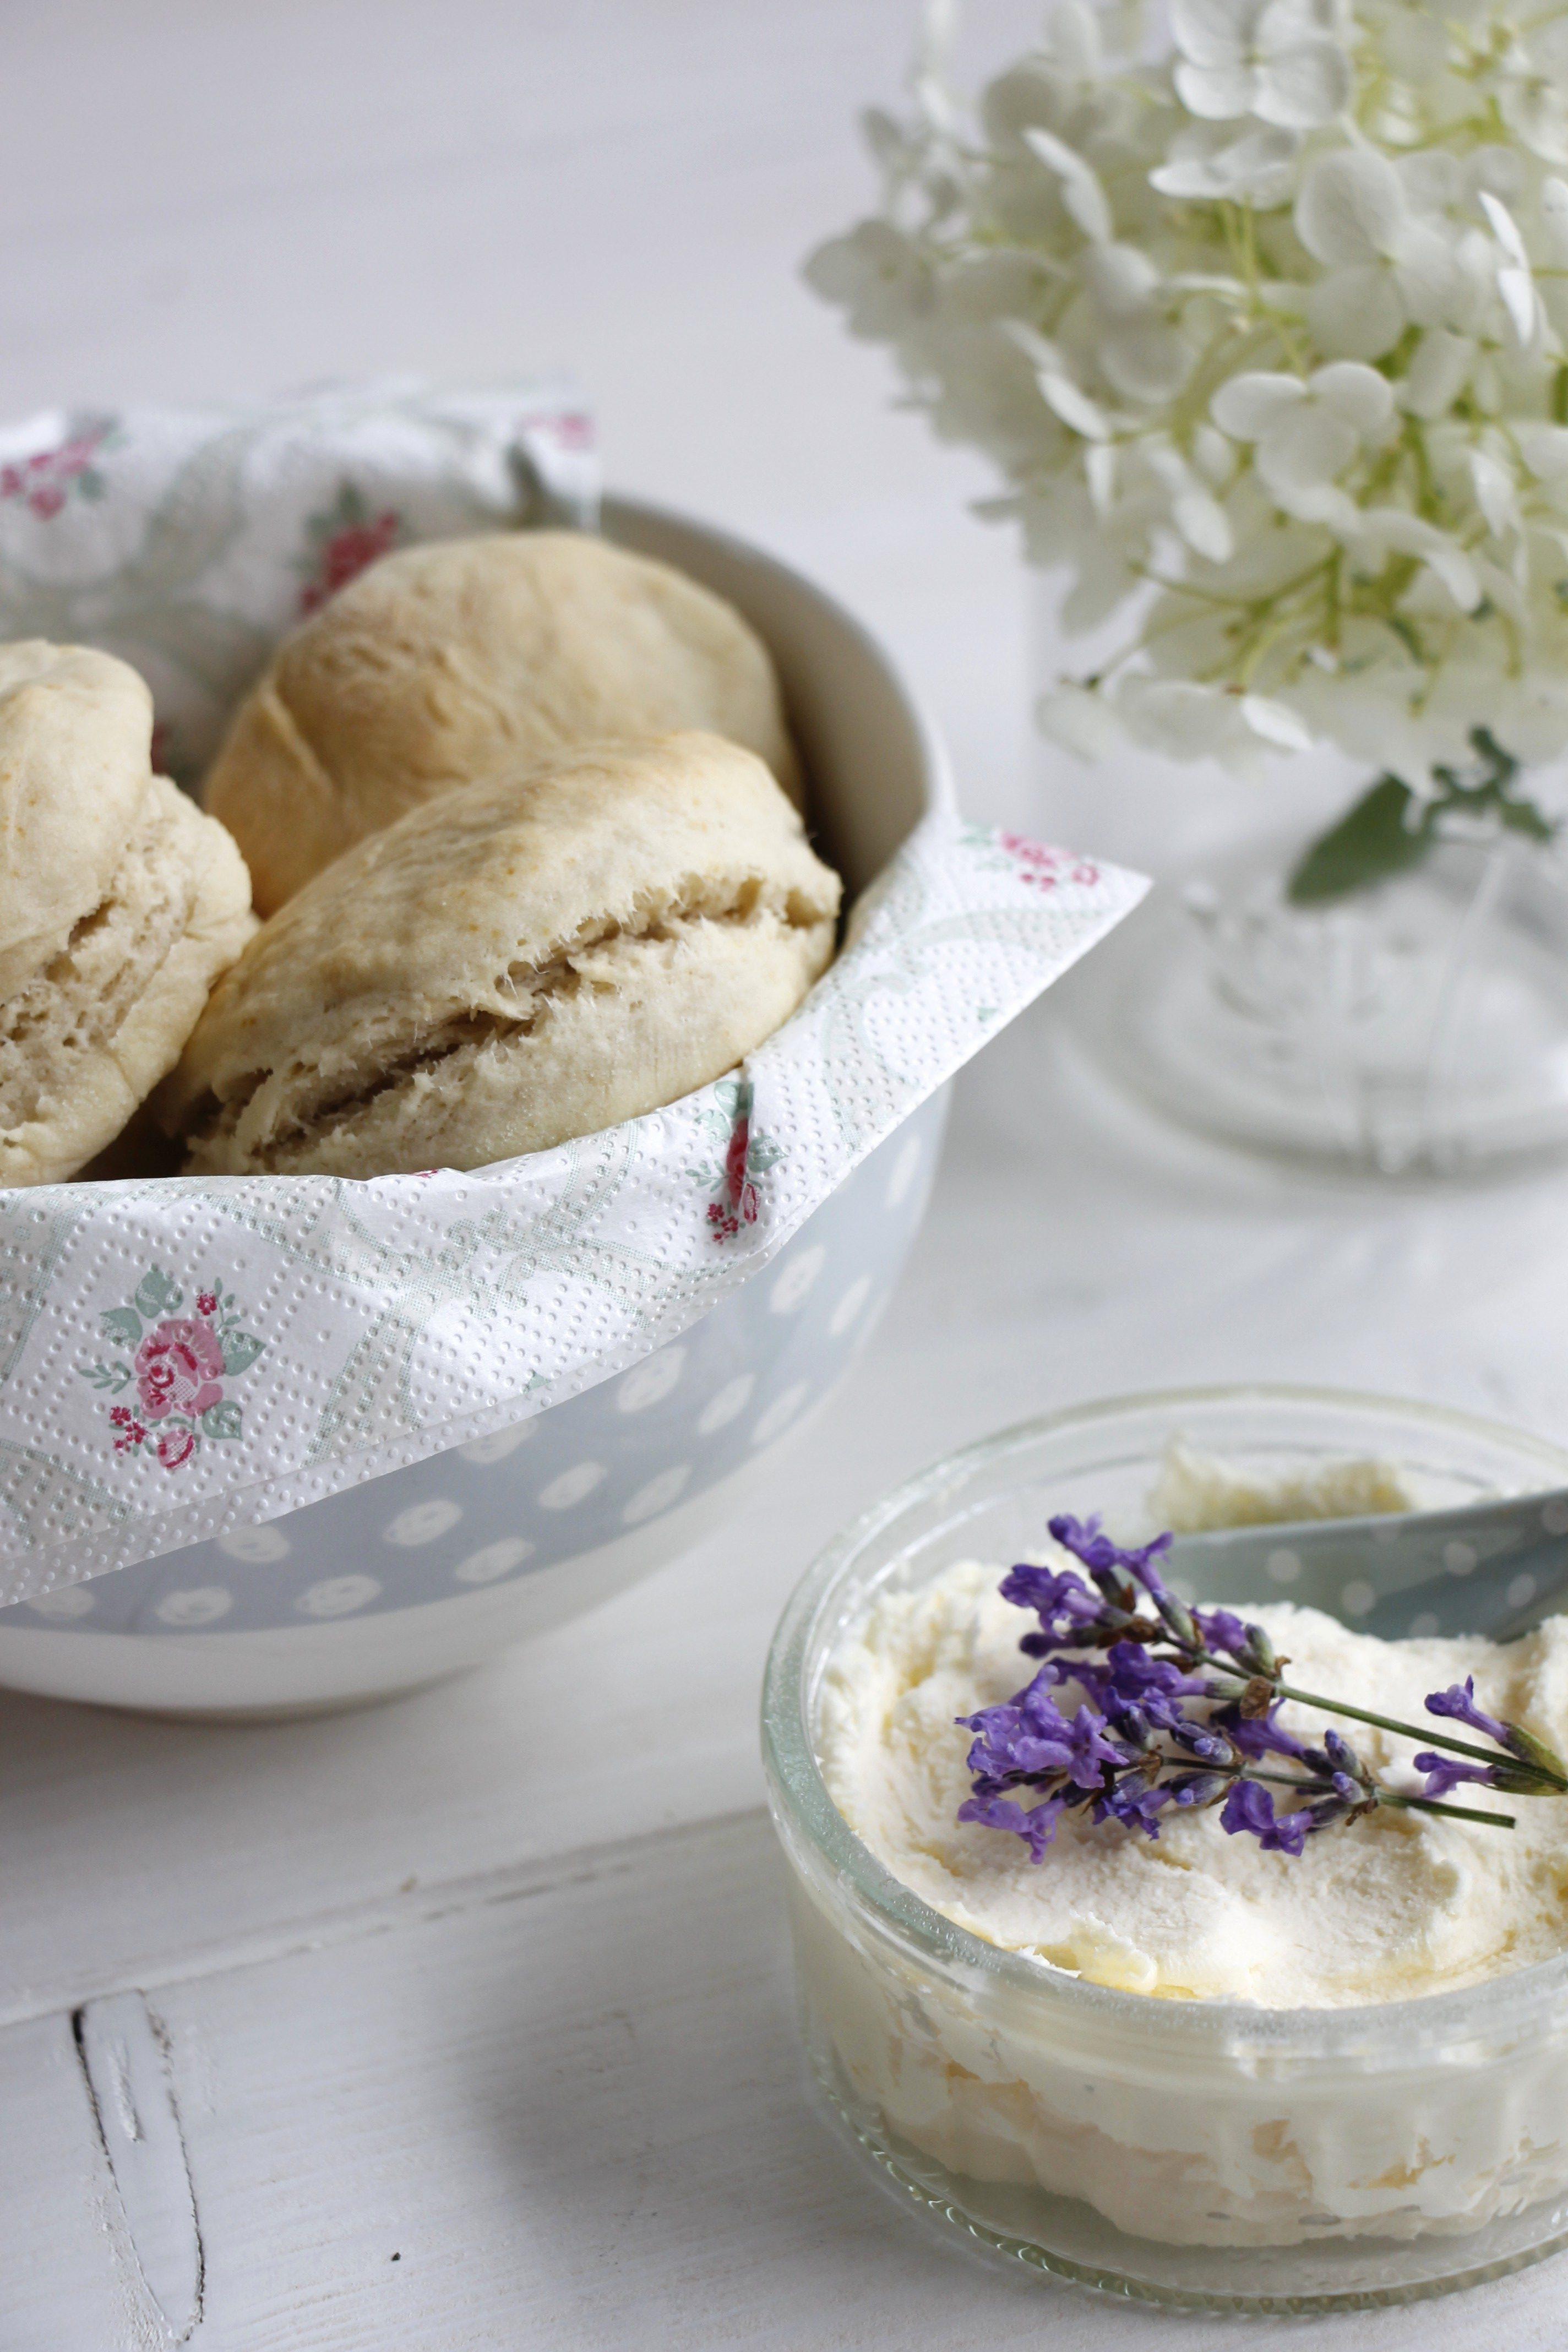 clotted cream rezept einfach lavendelblog. Black Bedroom Furniture Sets. Home Design Ideas